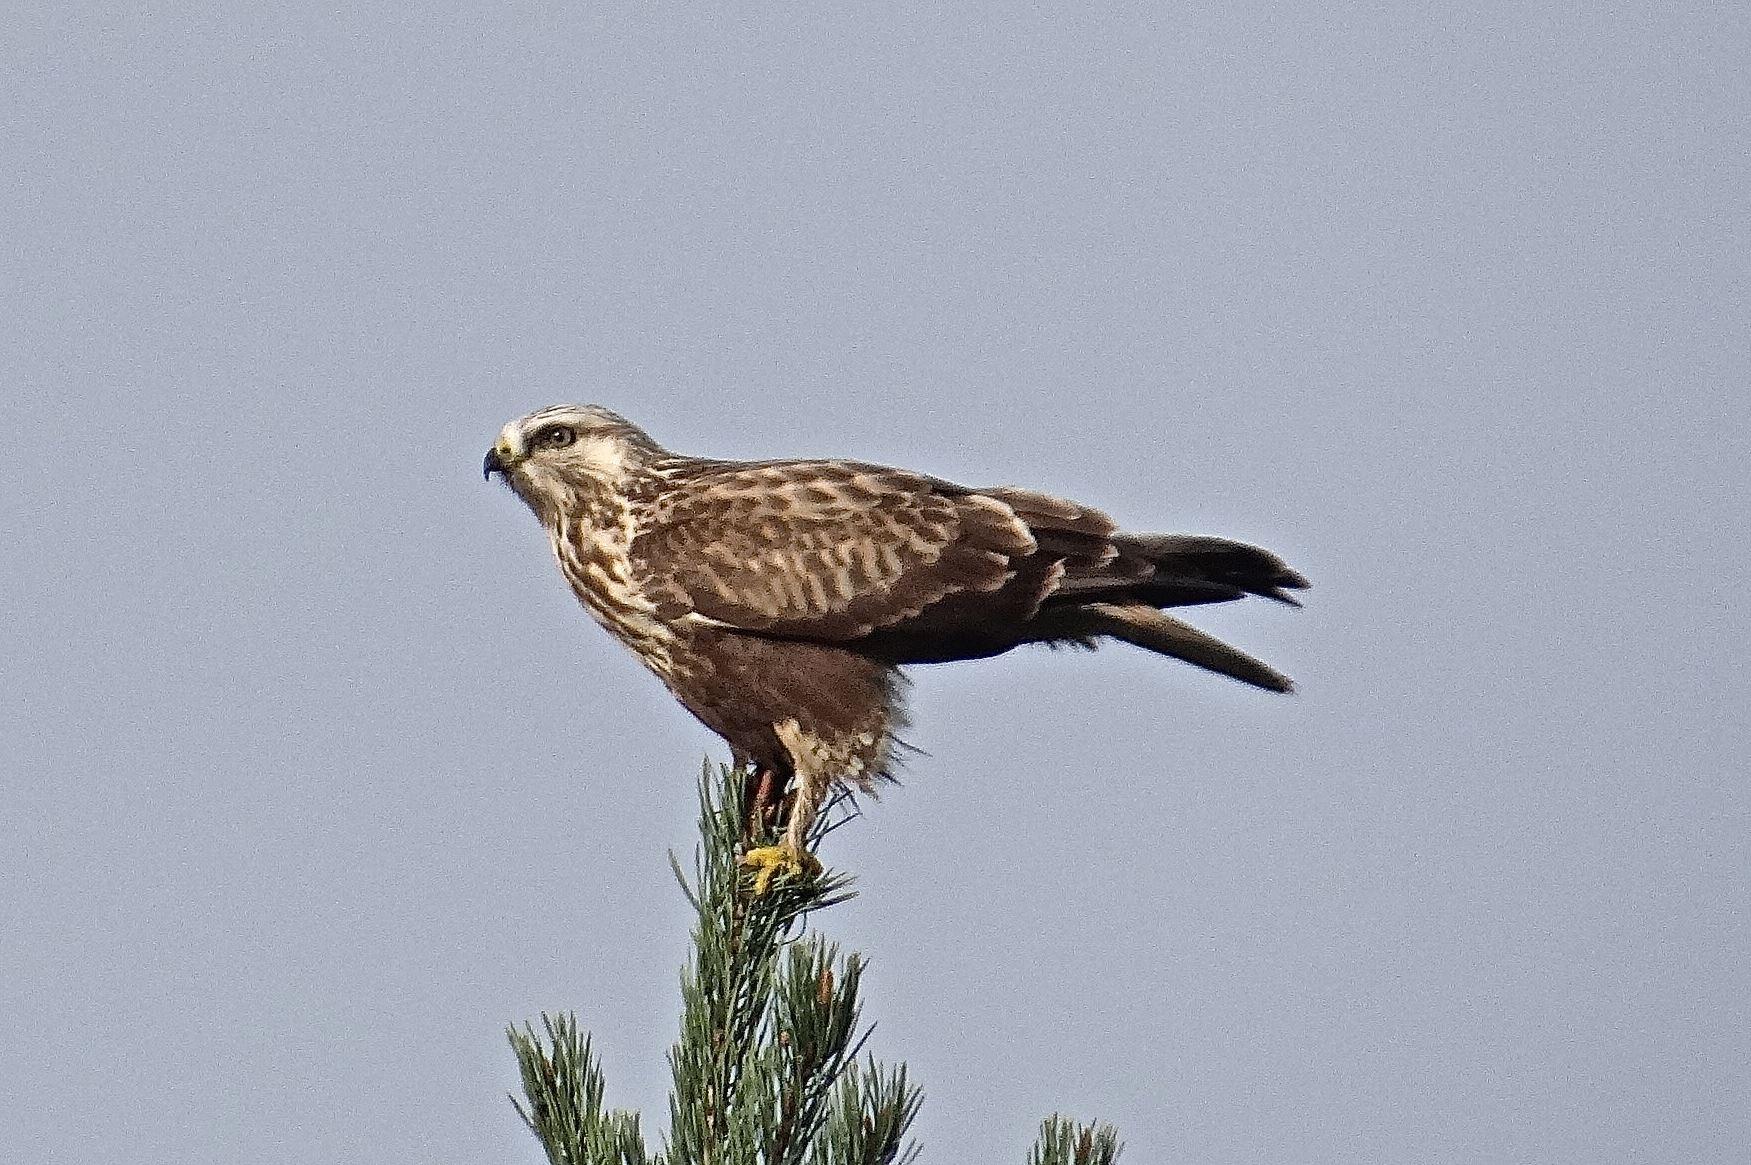 Svalgårdens Fågelmöte 5